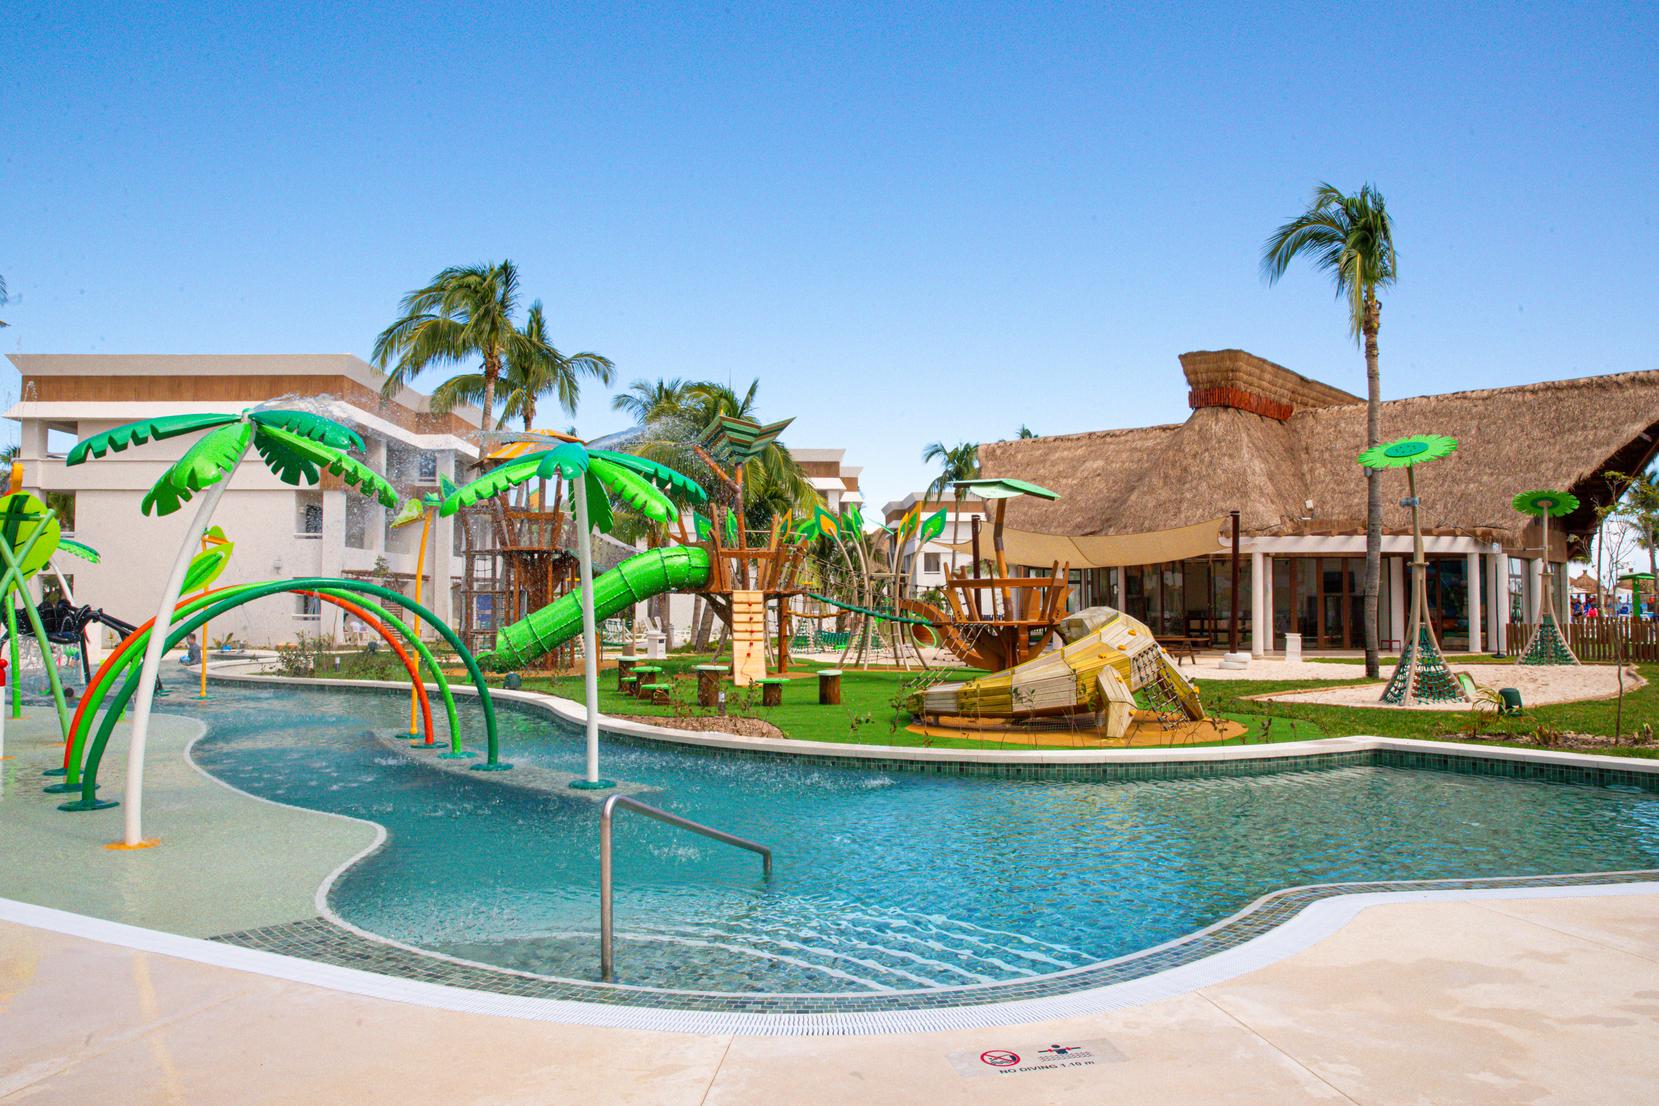 gbptul_mex_pool_waterpark_004_low